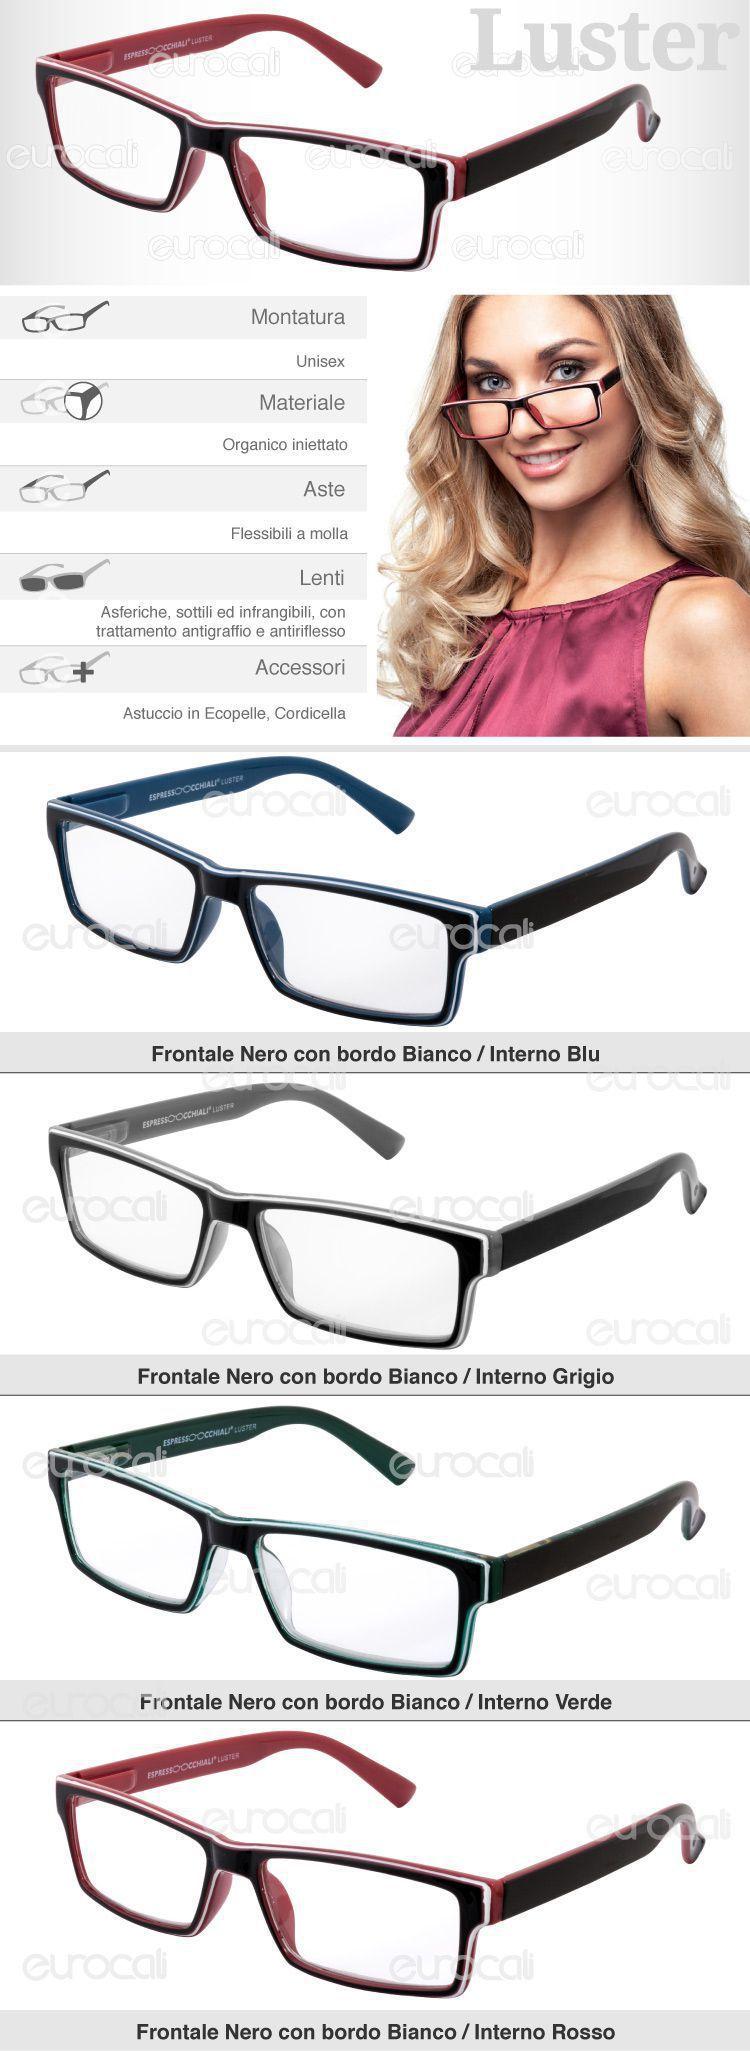 espresso occhiali